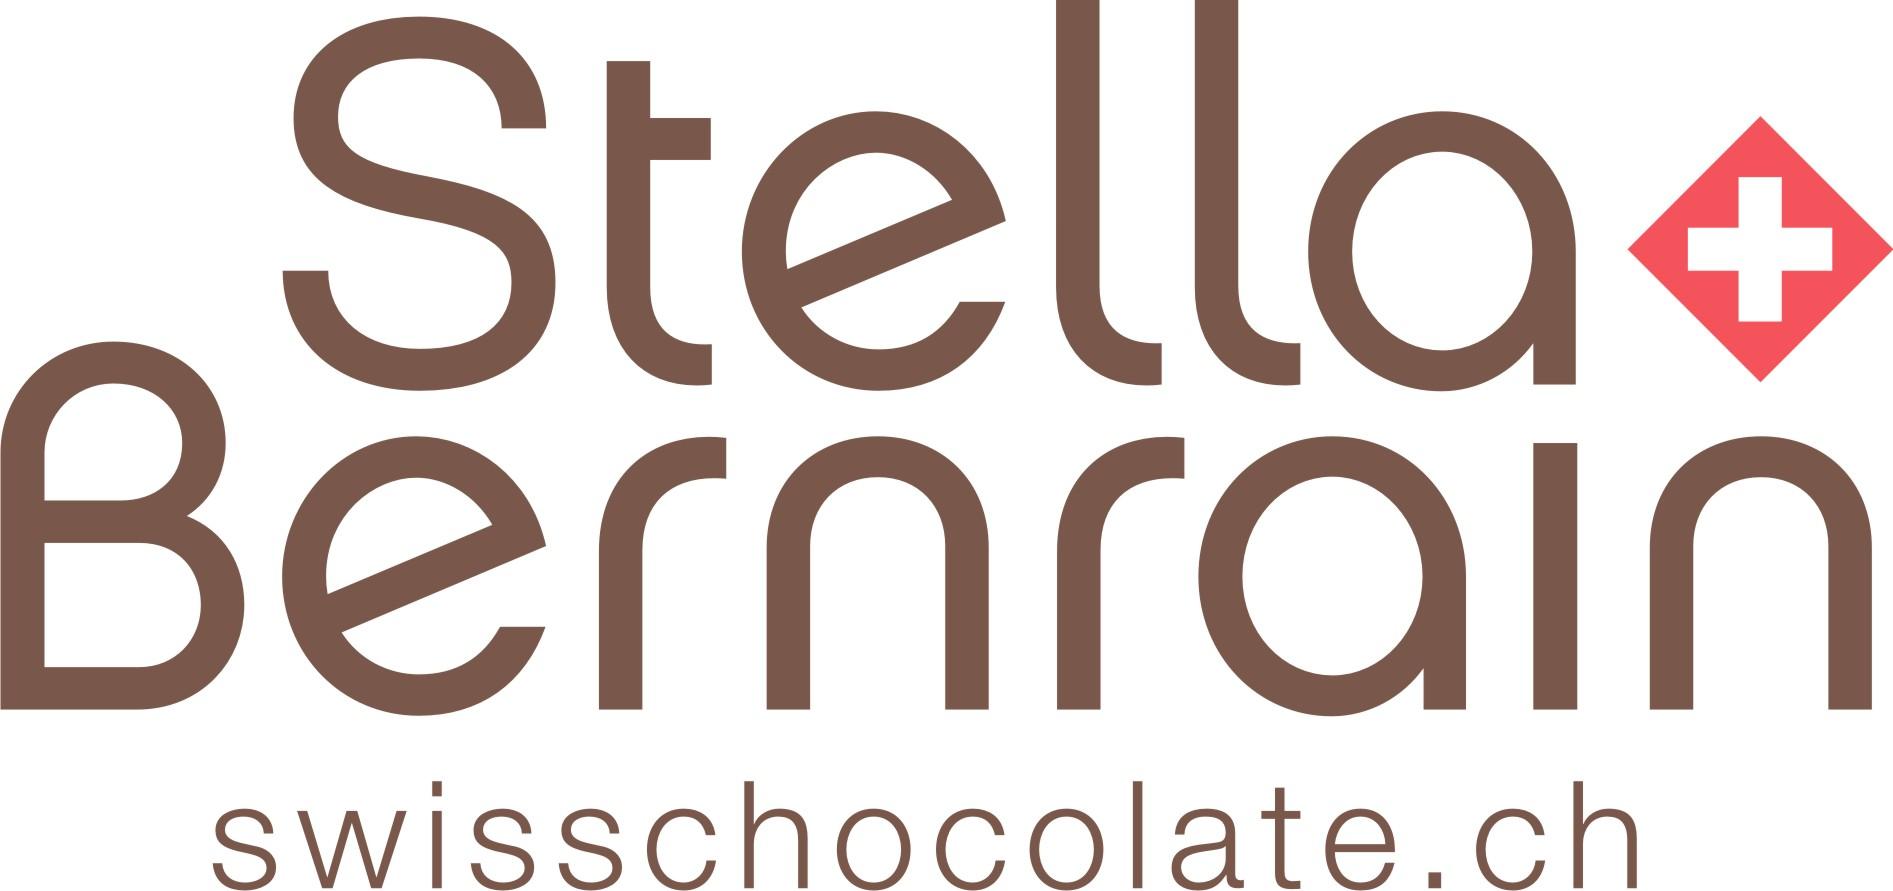 cobra CRM bei Chocolat Stella Bernrain